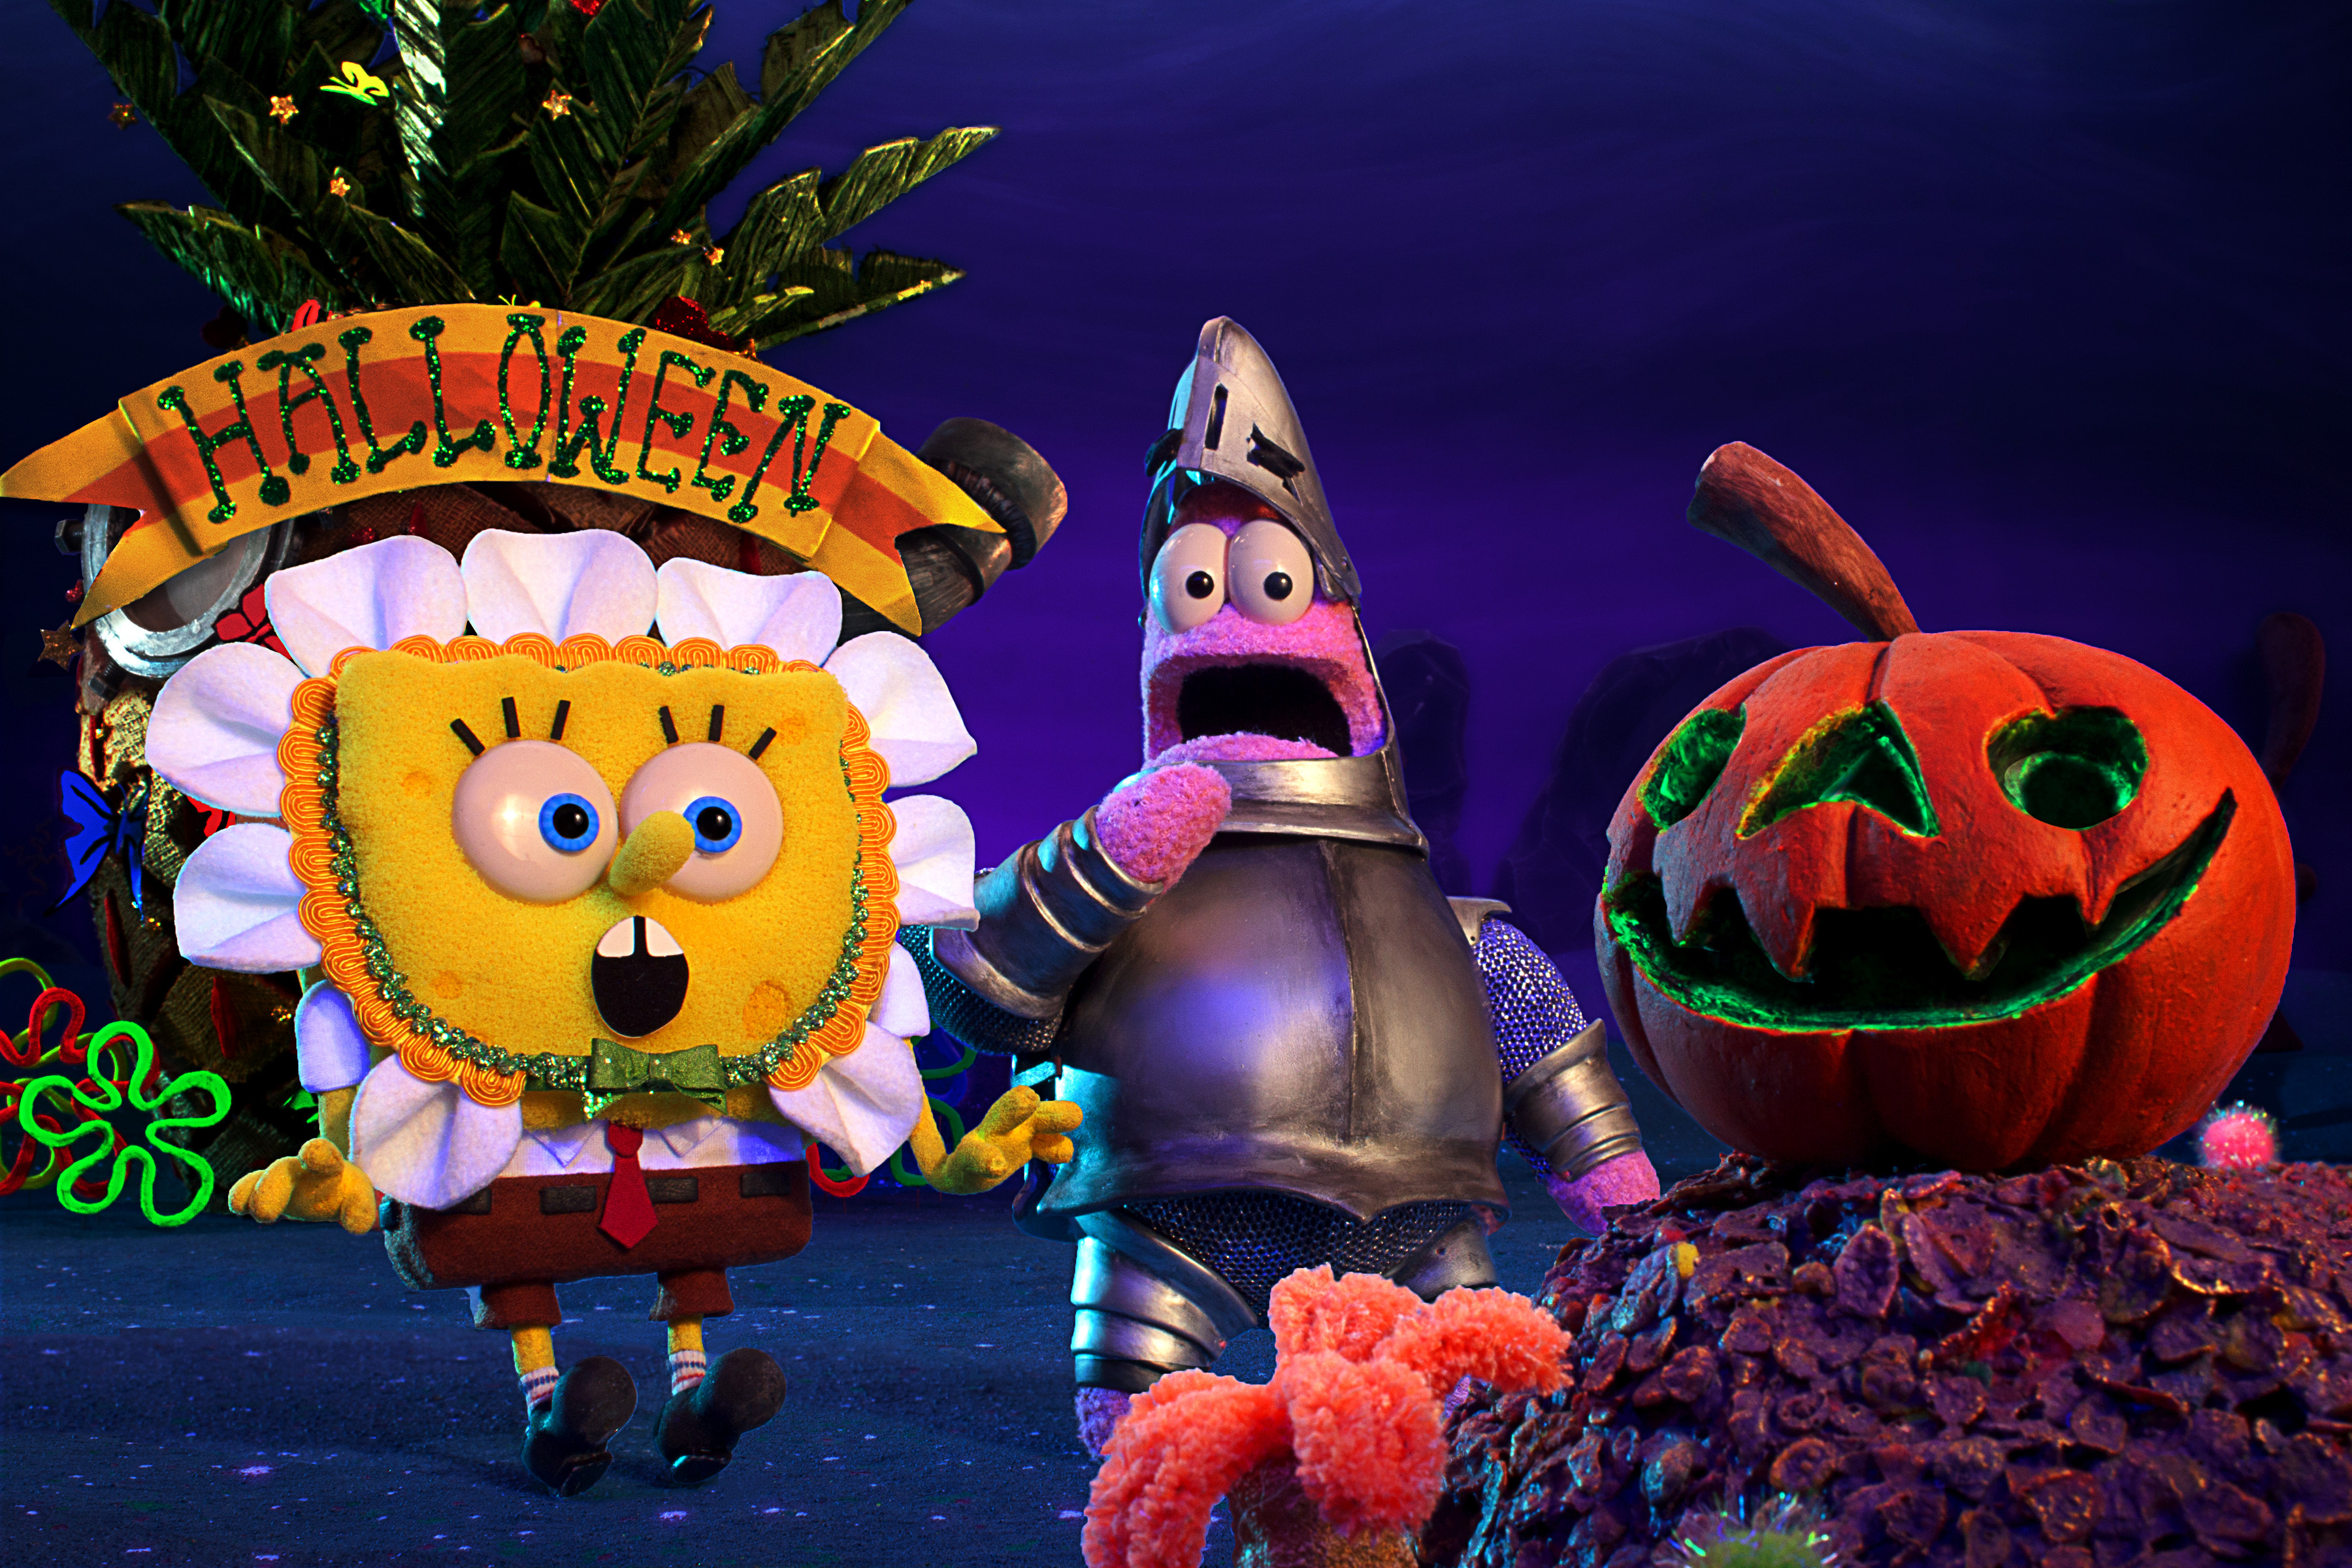 Nickelodeon to Premiere Brand-New SpongeBob SquarePants Halloween ...